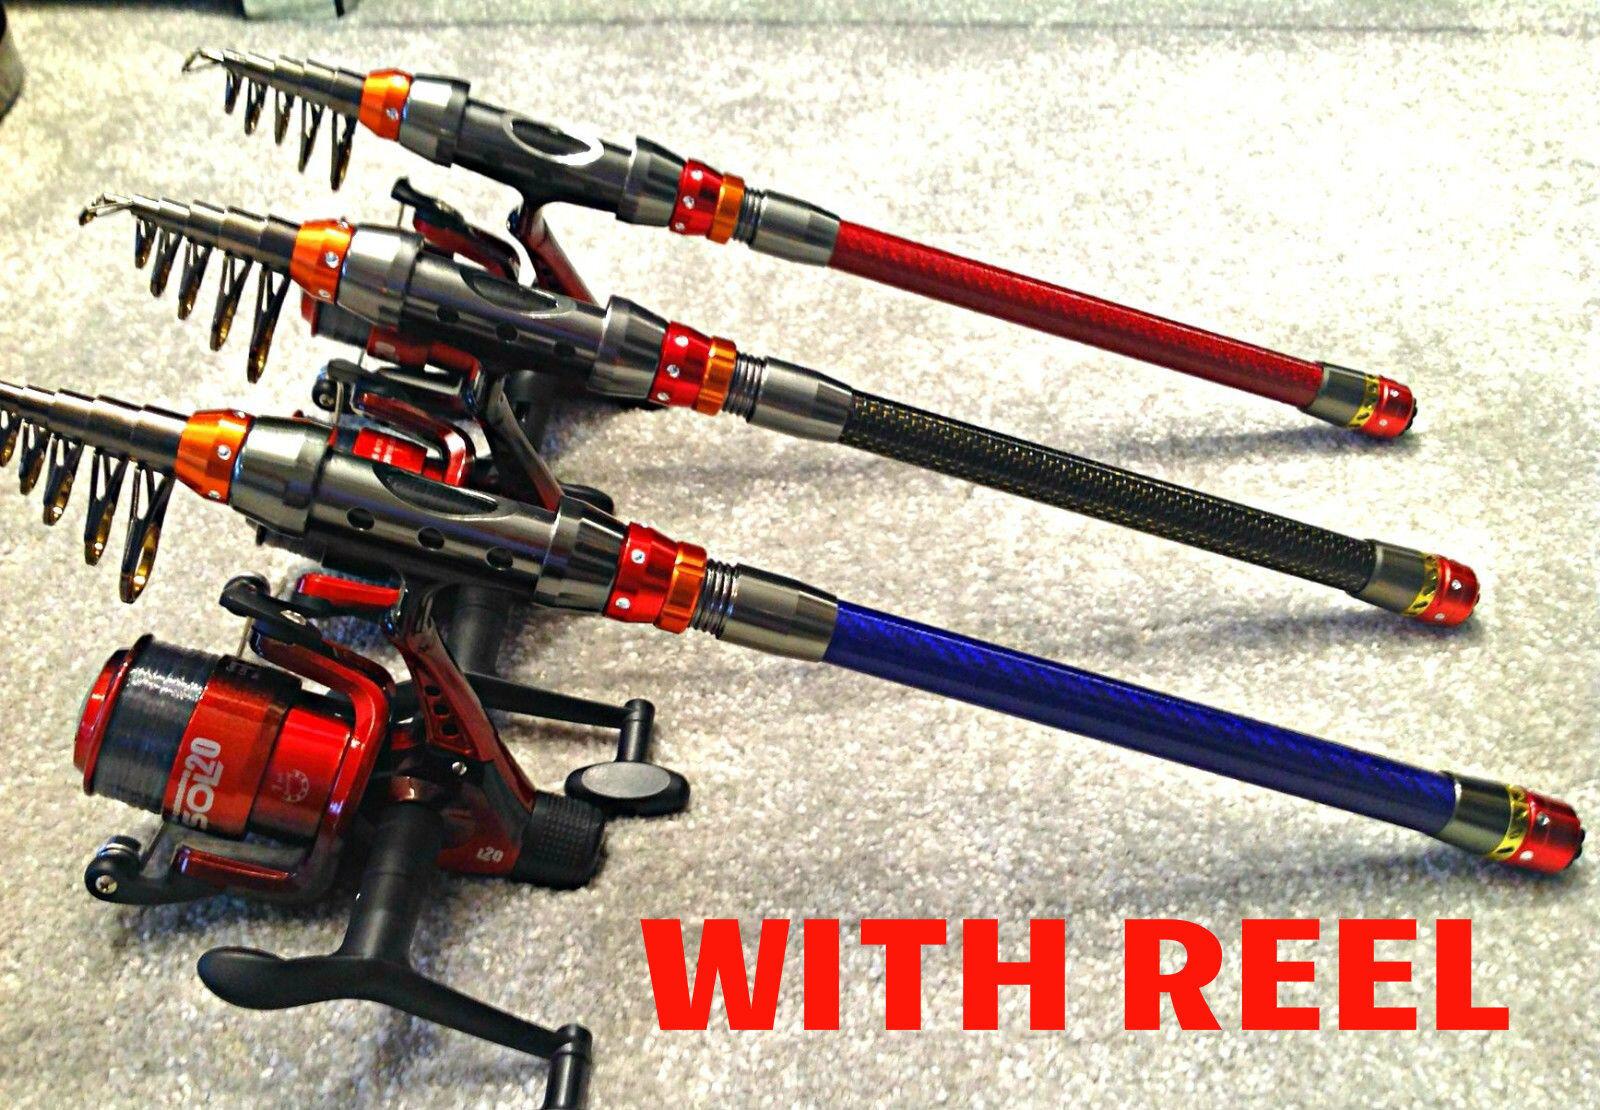 PIKE ROD REEL & REEL ROD SETUP / TELESCOPIC TRAVEL ROD 2.1M / IDEAL FOR STALKING,SPINNING c14998